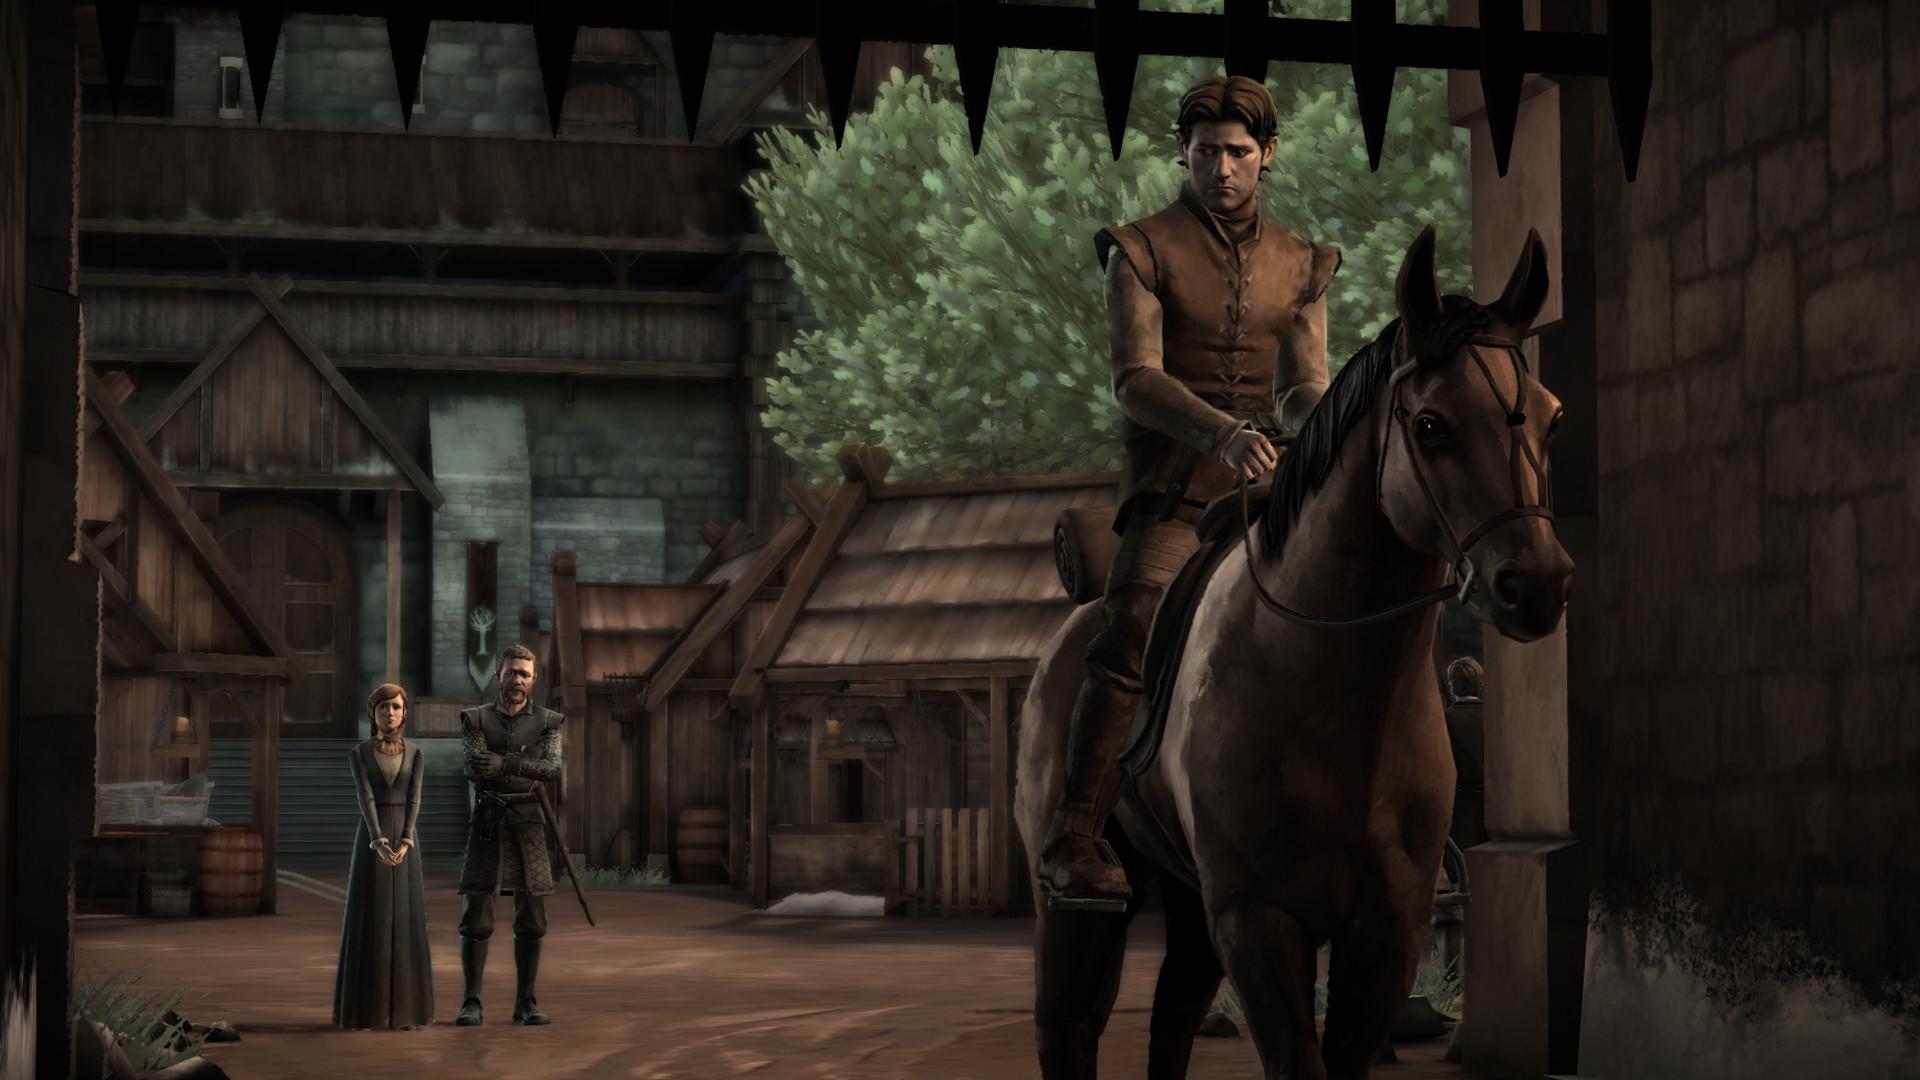 Скриншот Game of Thrones: A Telltale Games Series Ep. 1-4